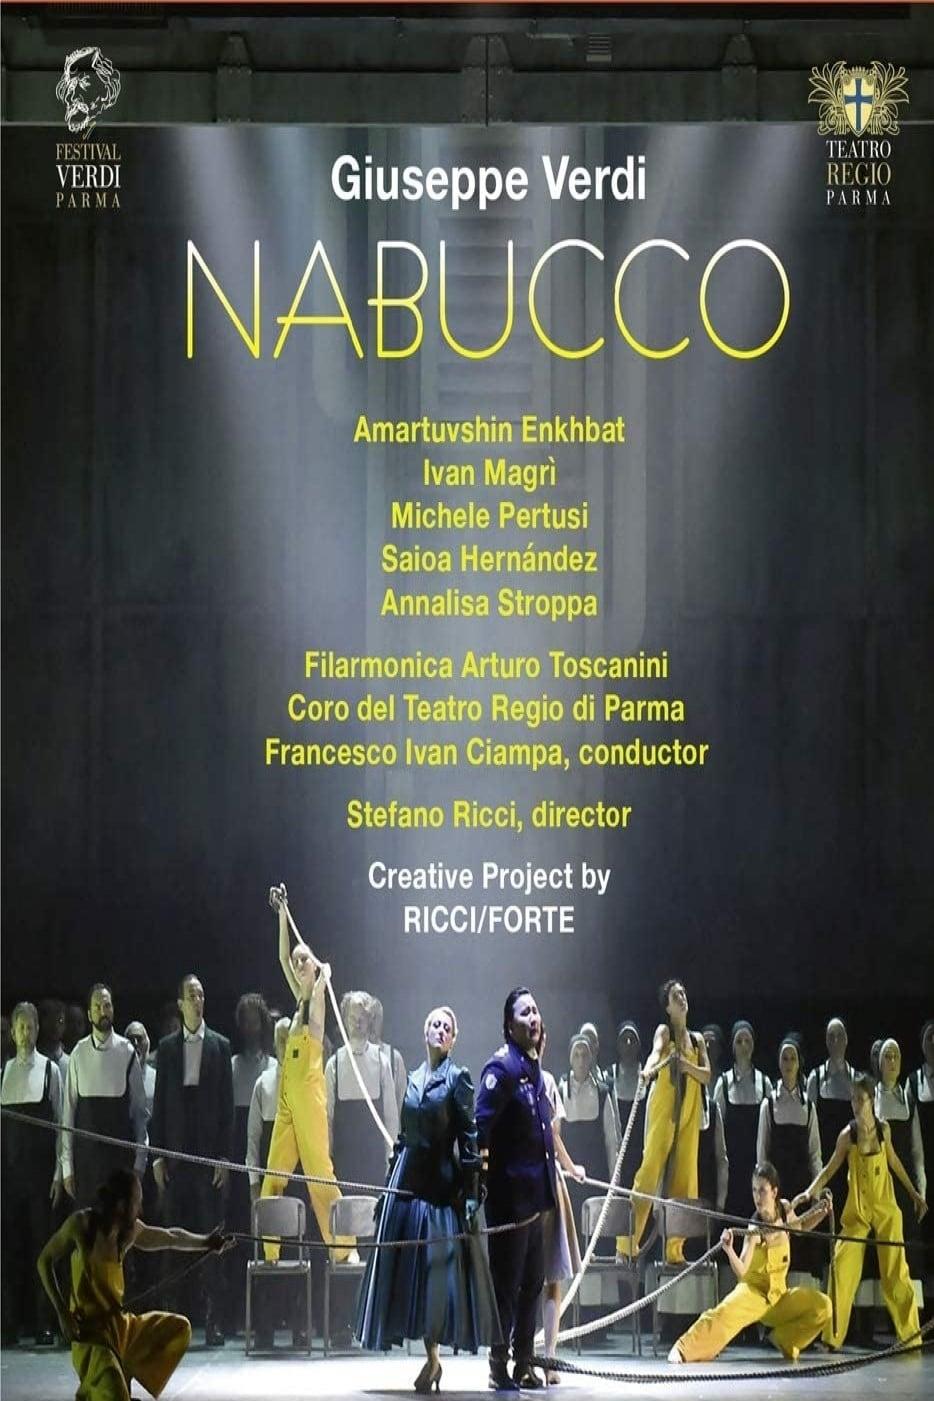 Nabucco - TEATRO REGIO PARMA (2020)